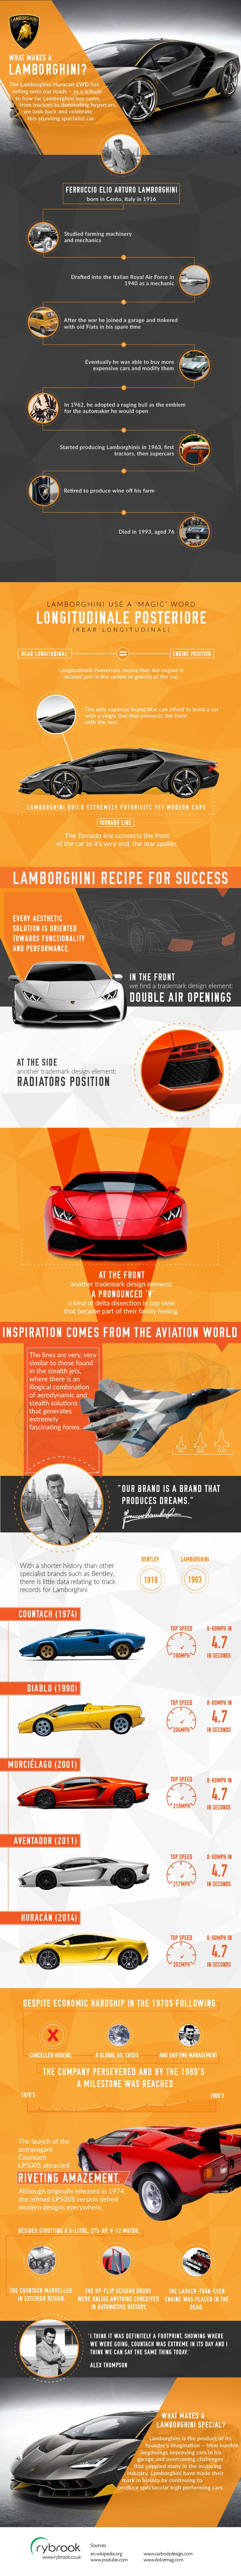 What Makes a Lamborghini?